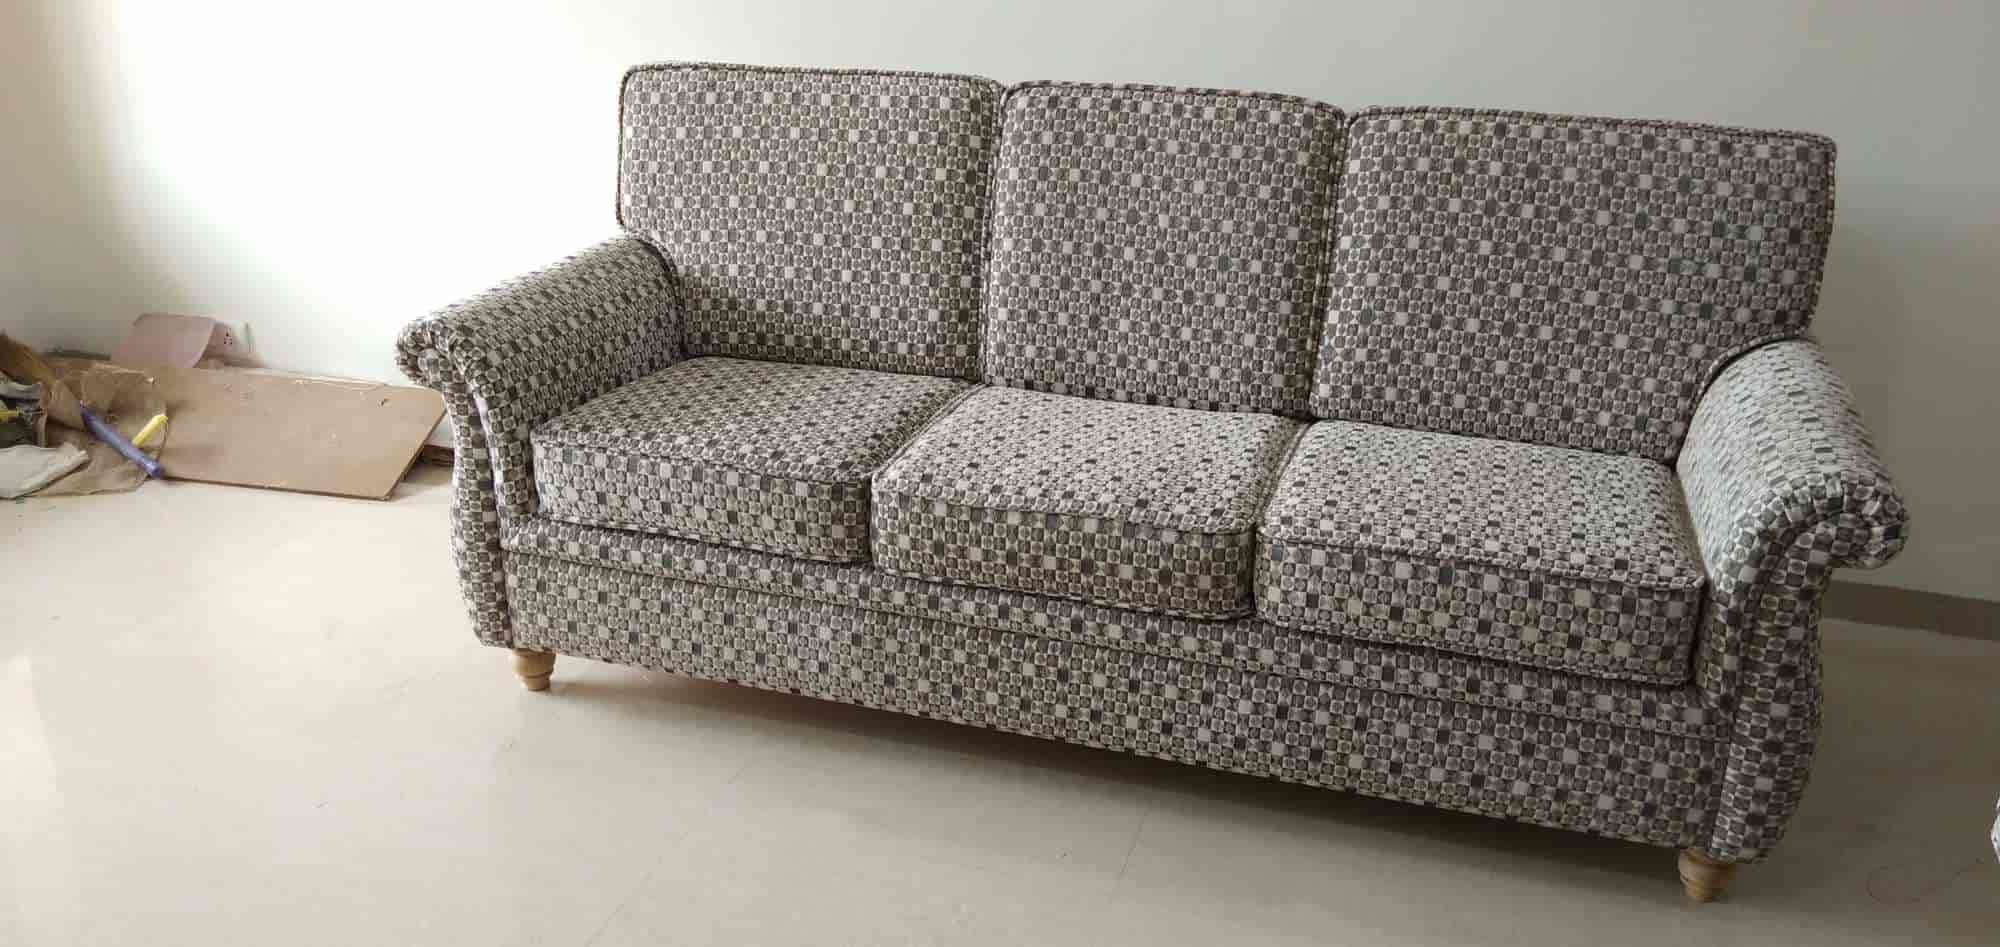 Metro Sofa Works Thane West Furniture Repair Services